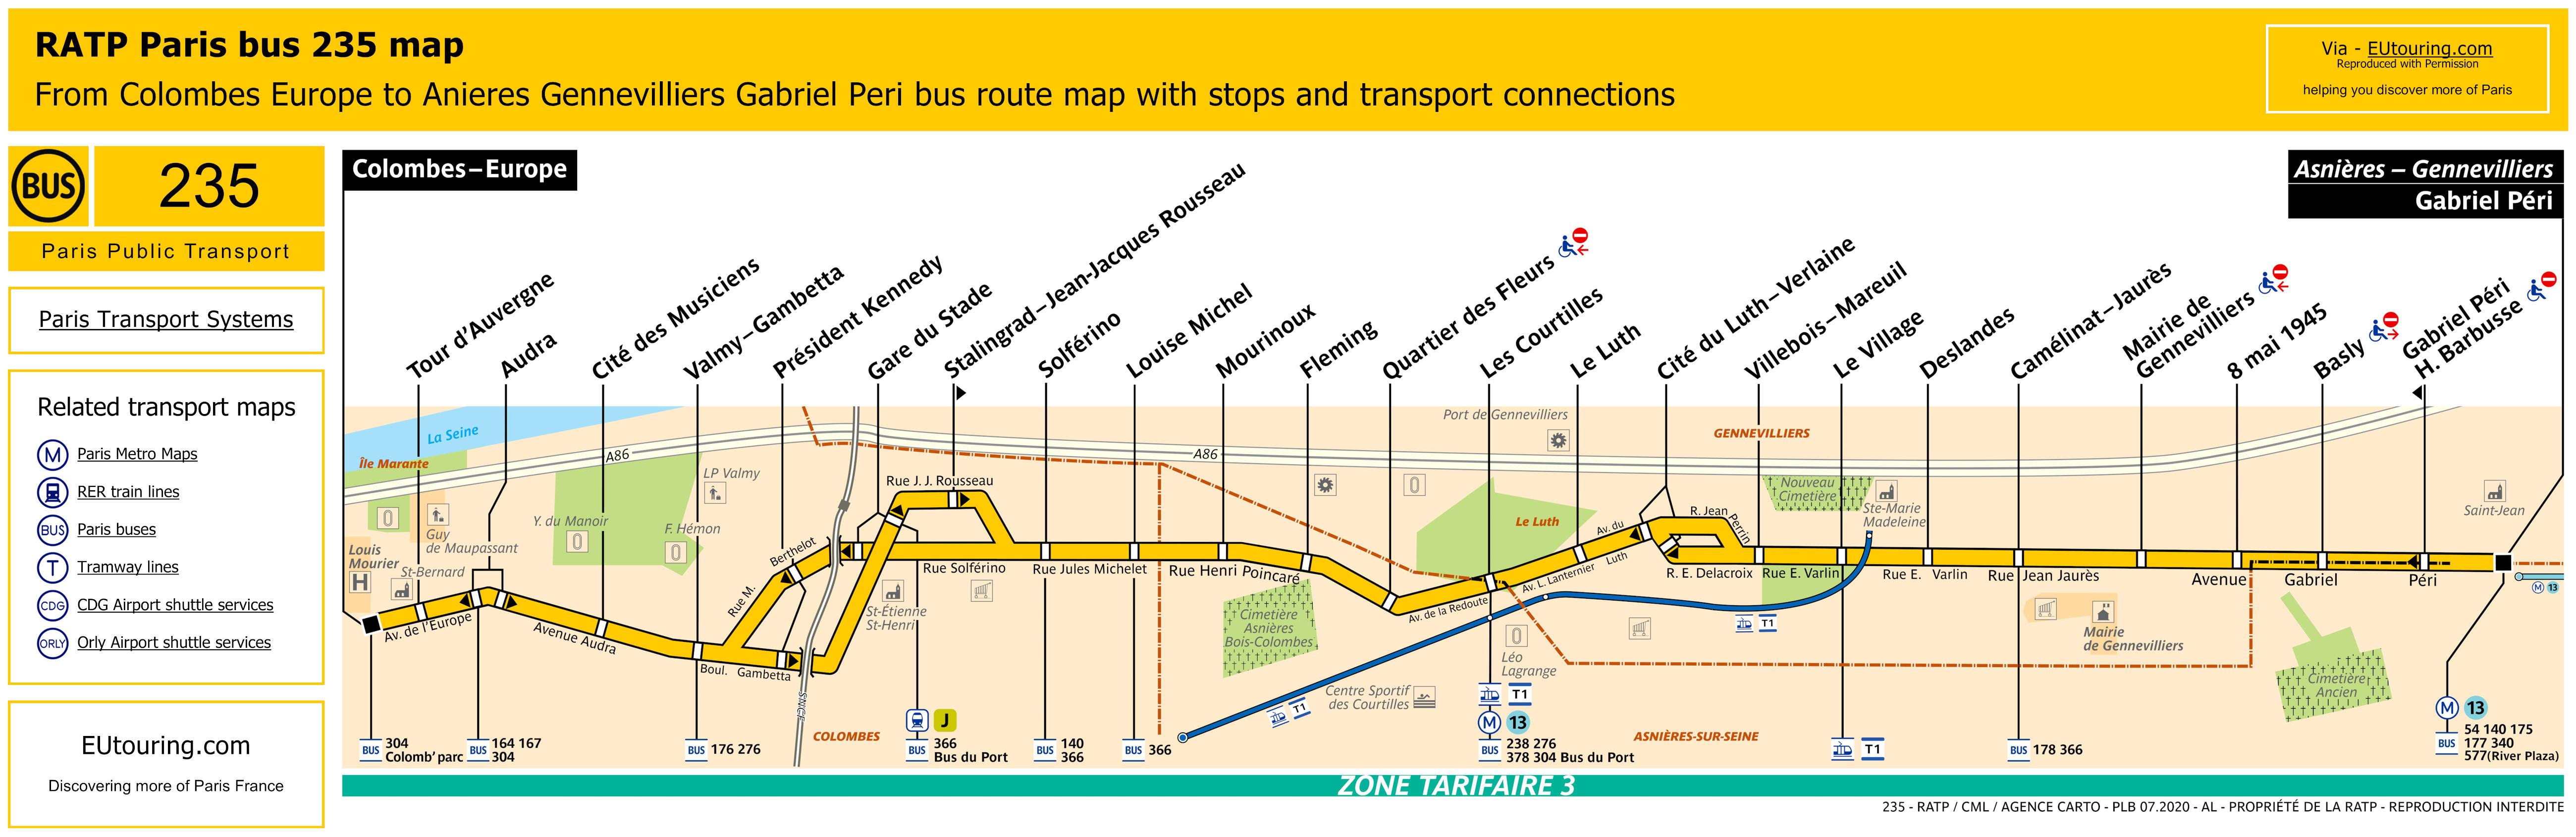 RATP route maps for Paris bus lines 230 through to 239